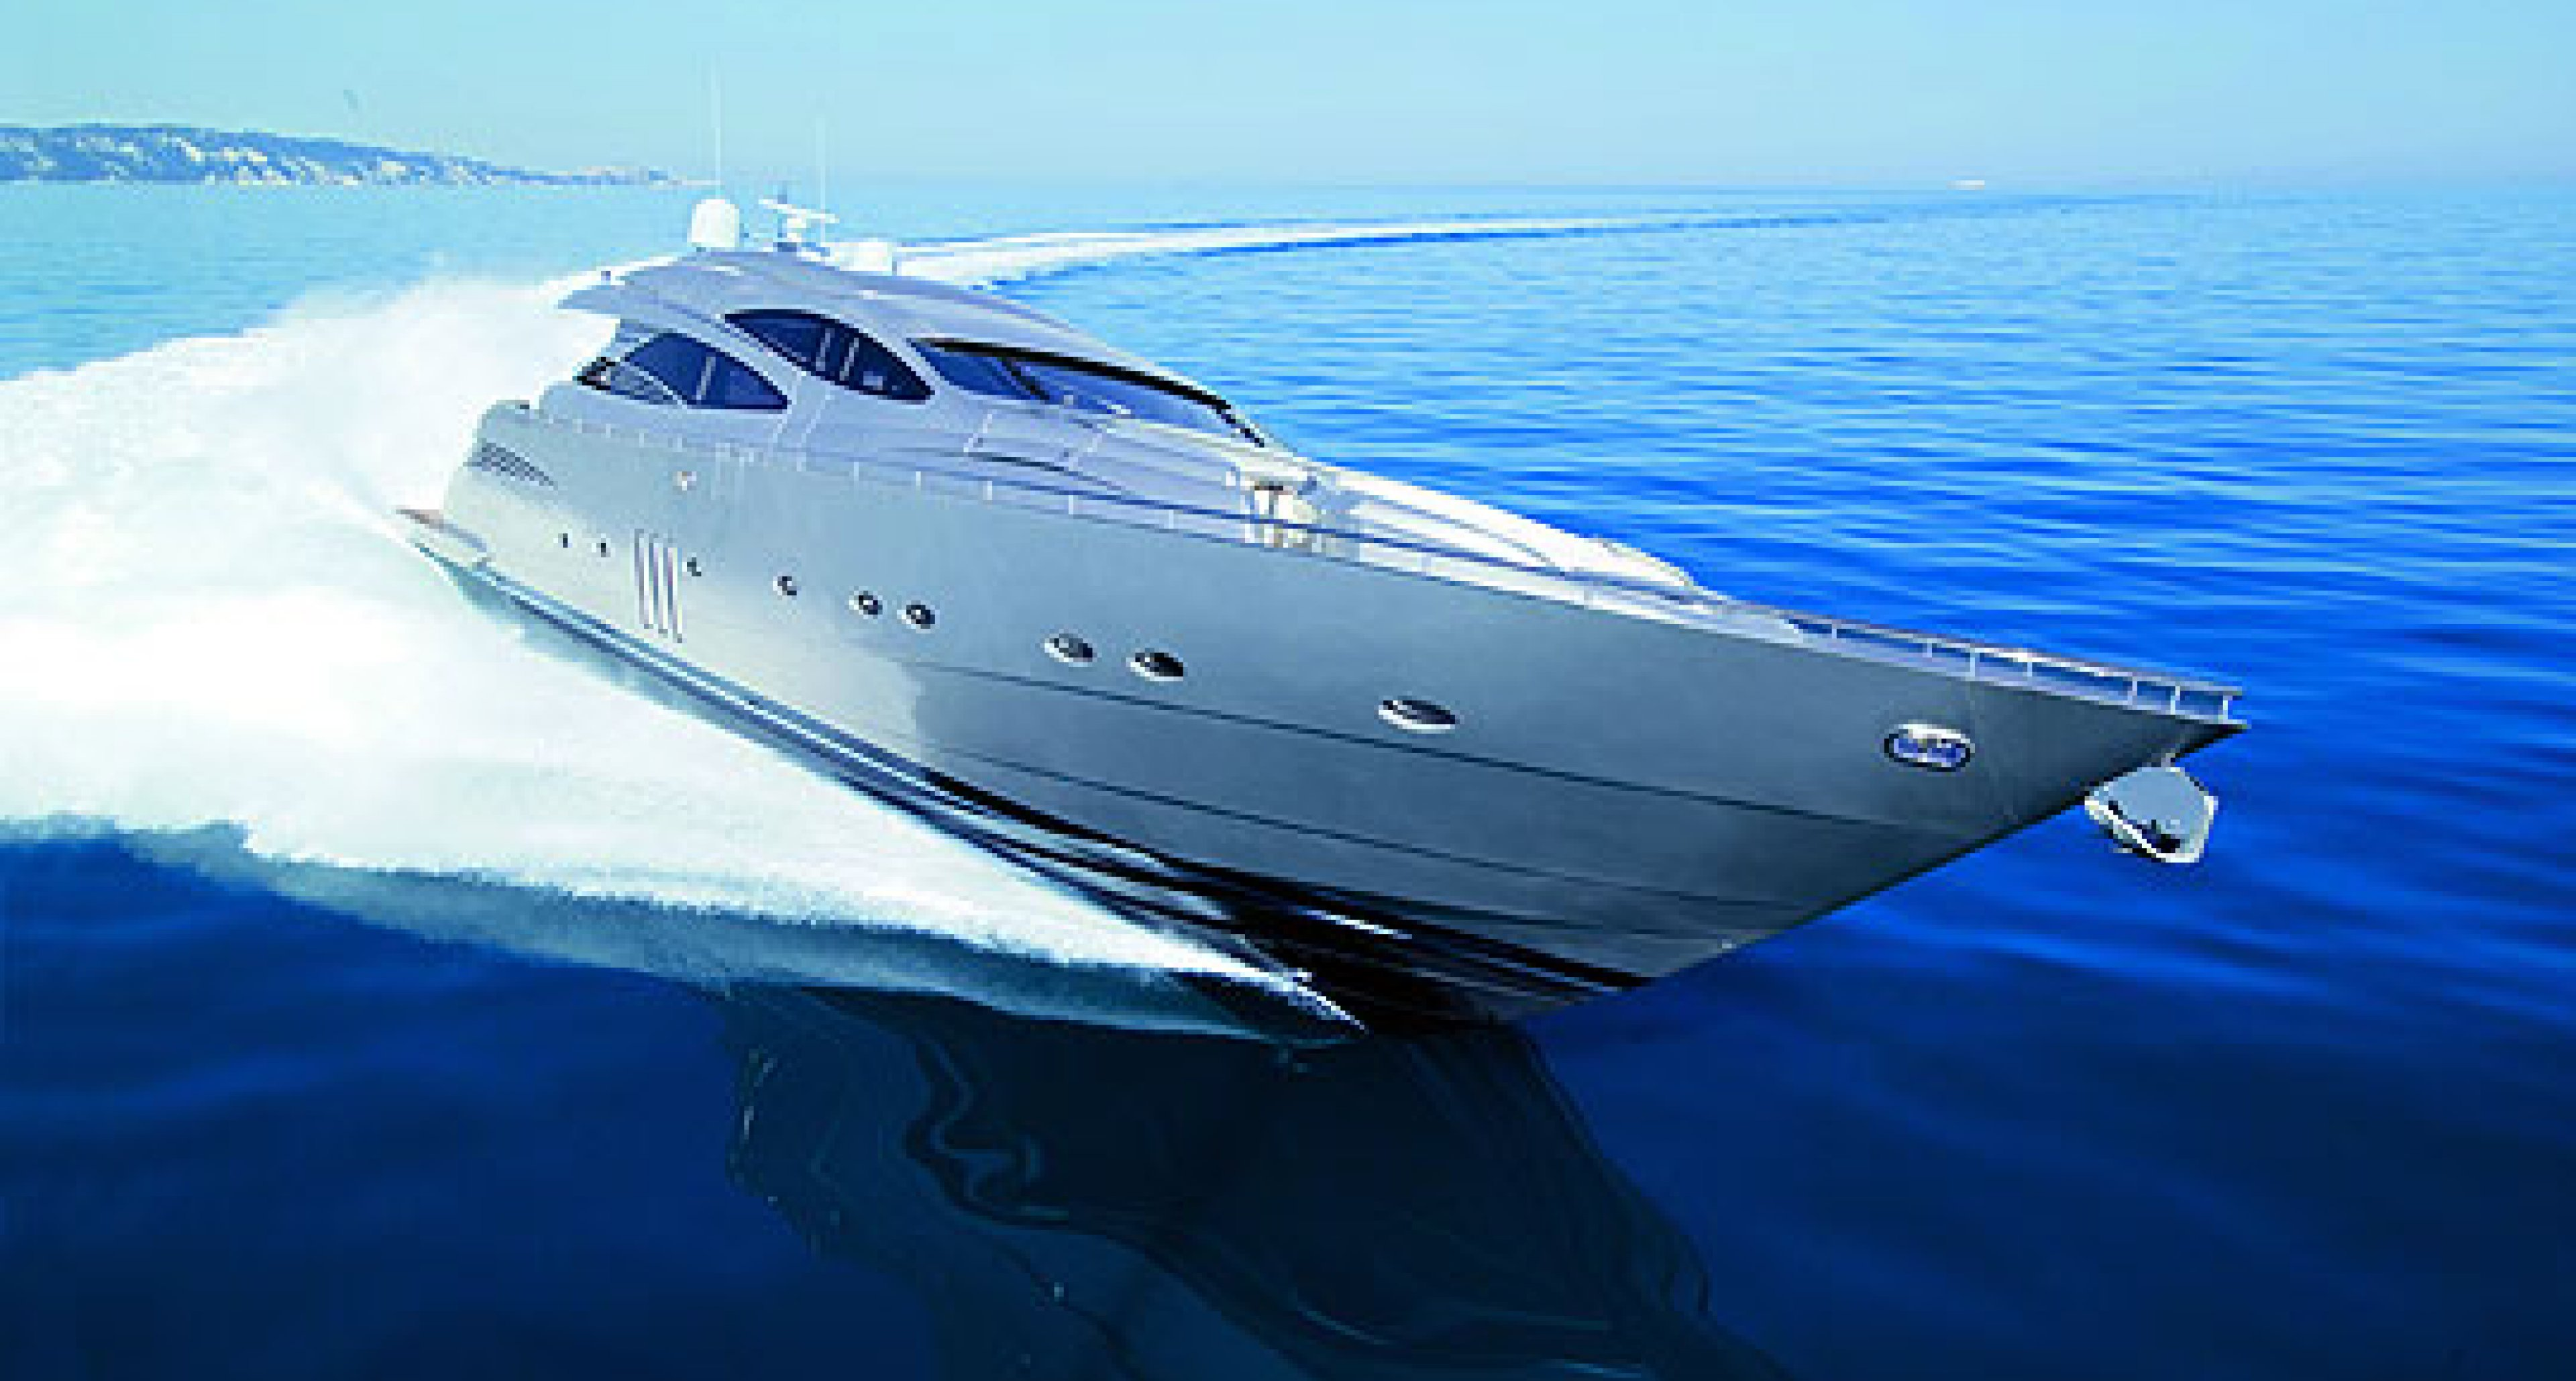 Monaco Yacht Show 2007: The Highlights